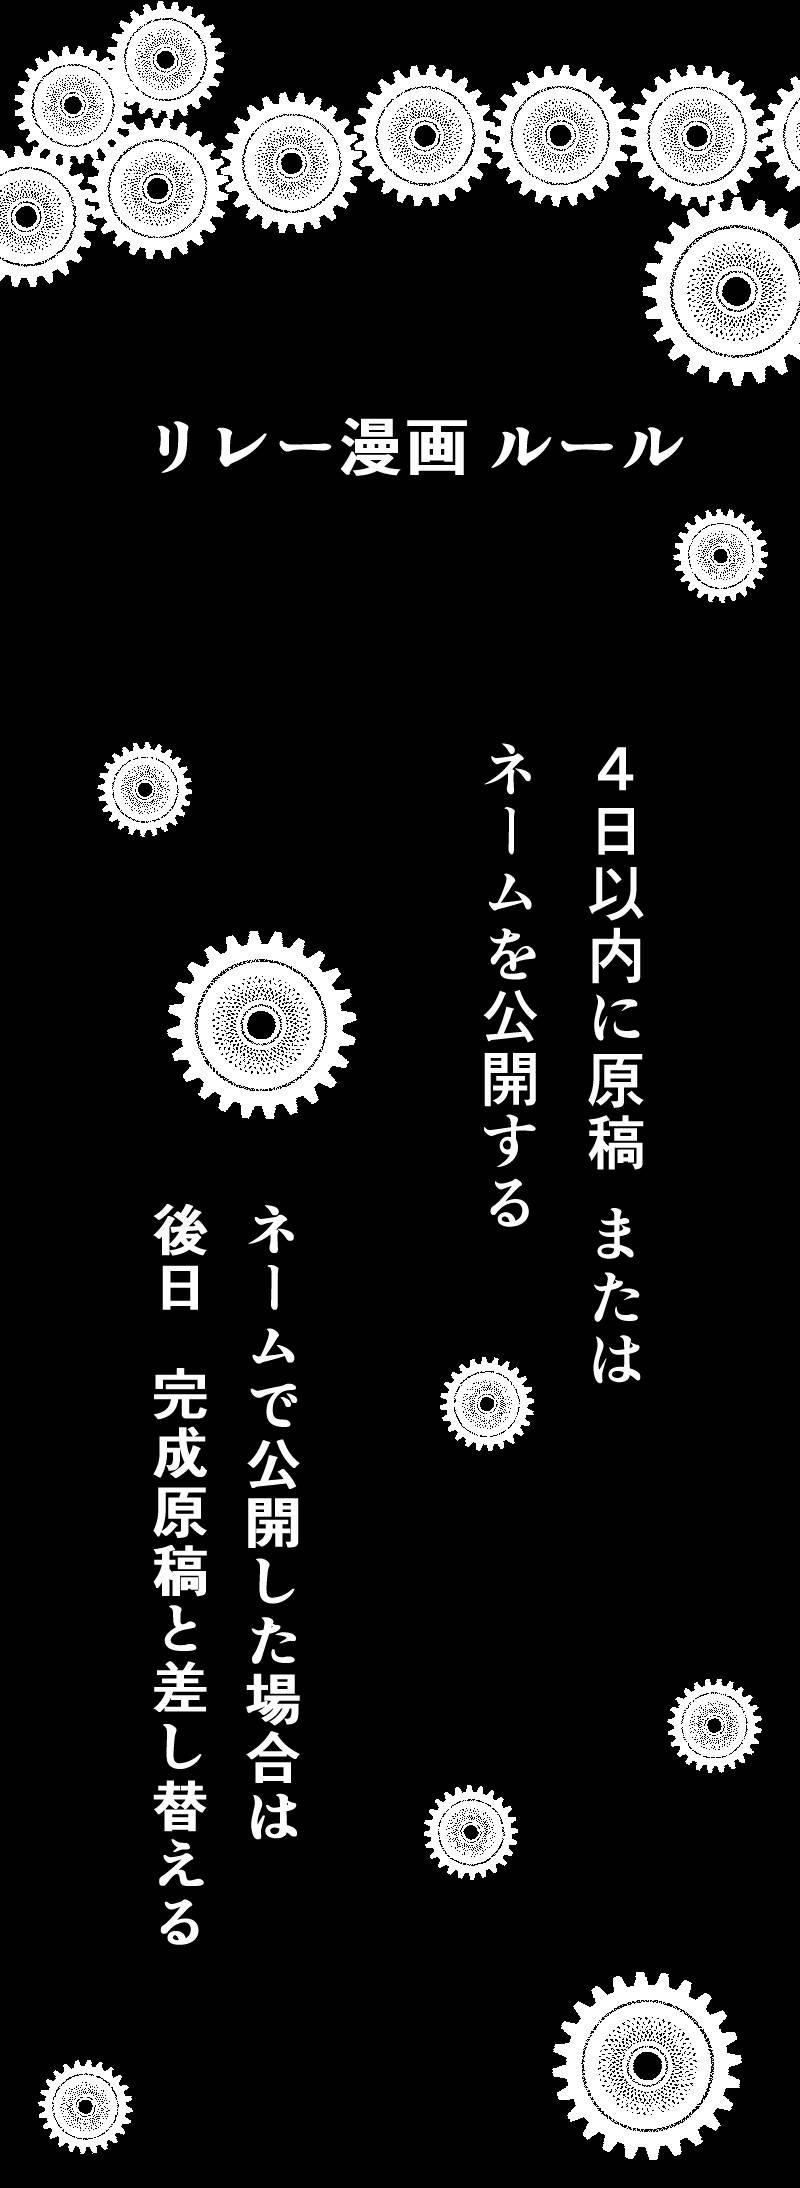 第2回 箱リレー漫画 第1話